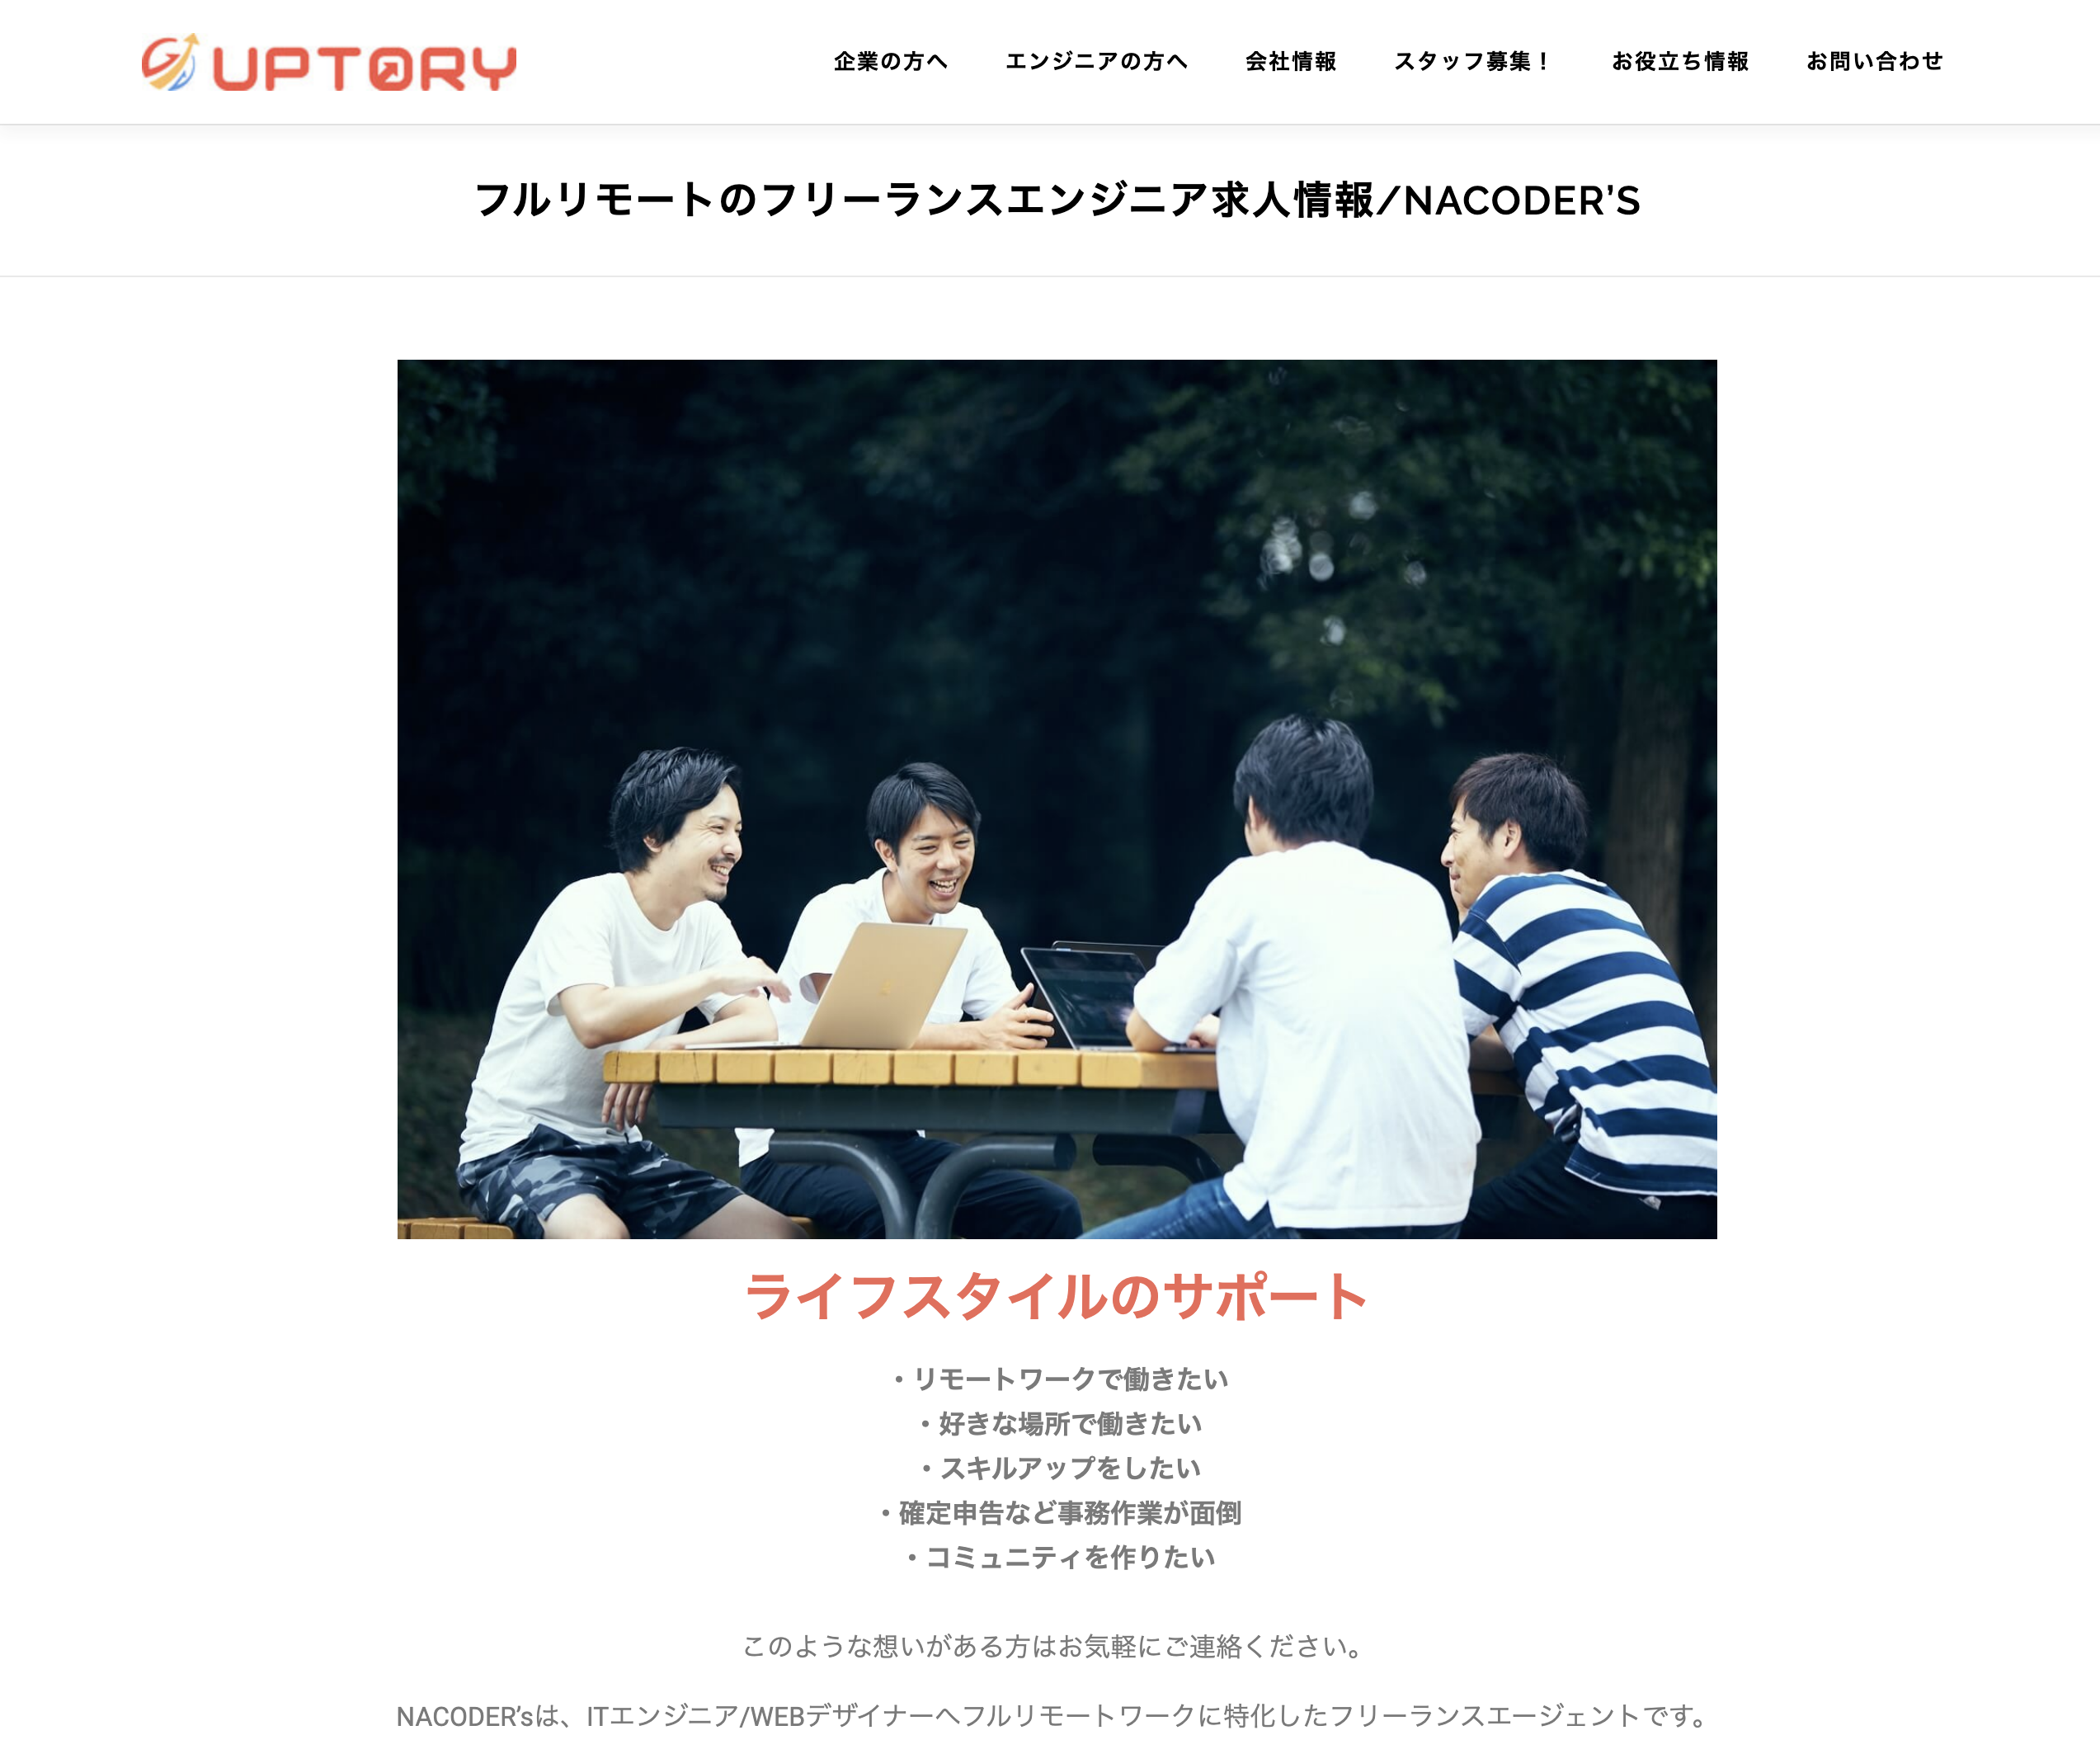 UPTORY(NACODER'S)公式サイトのスクリーンショット